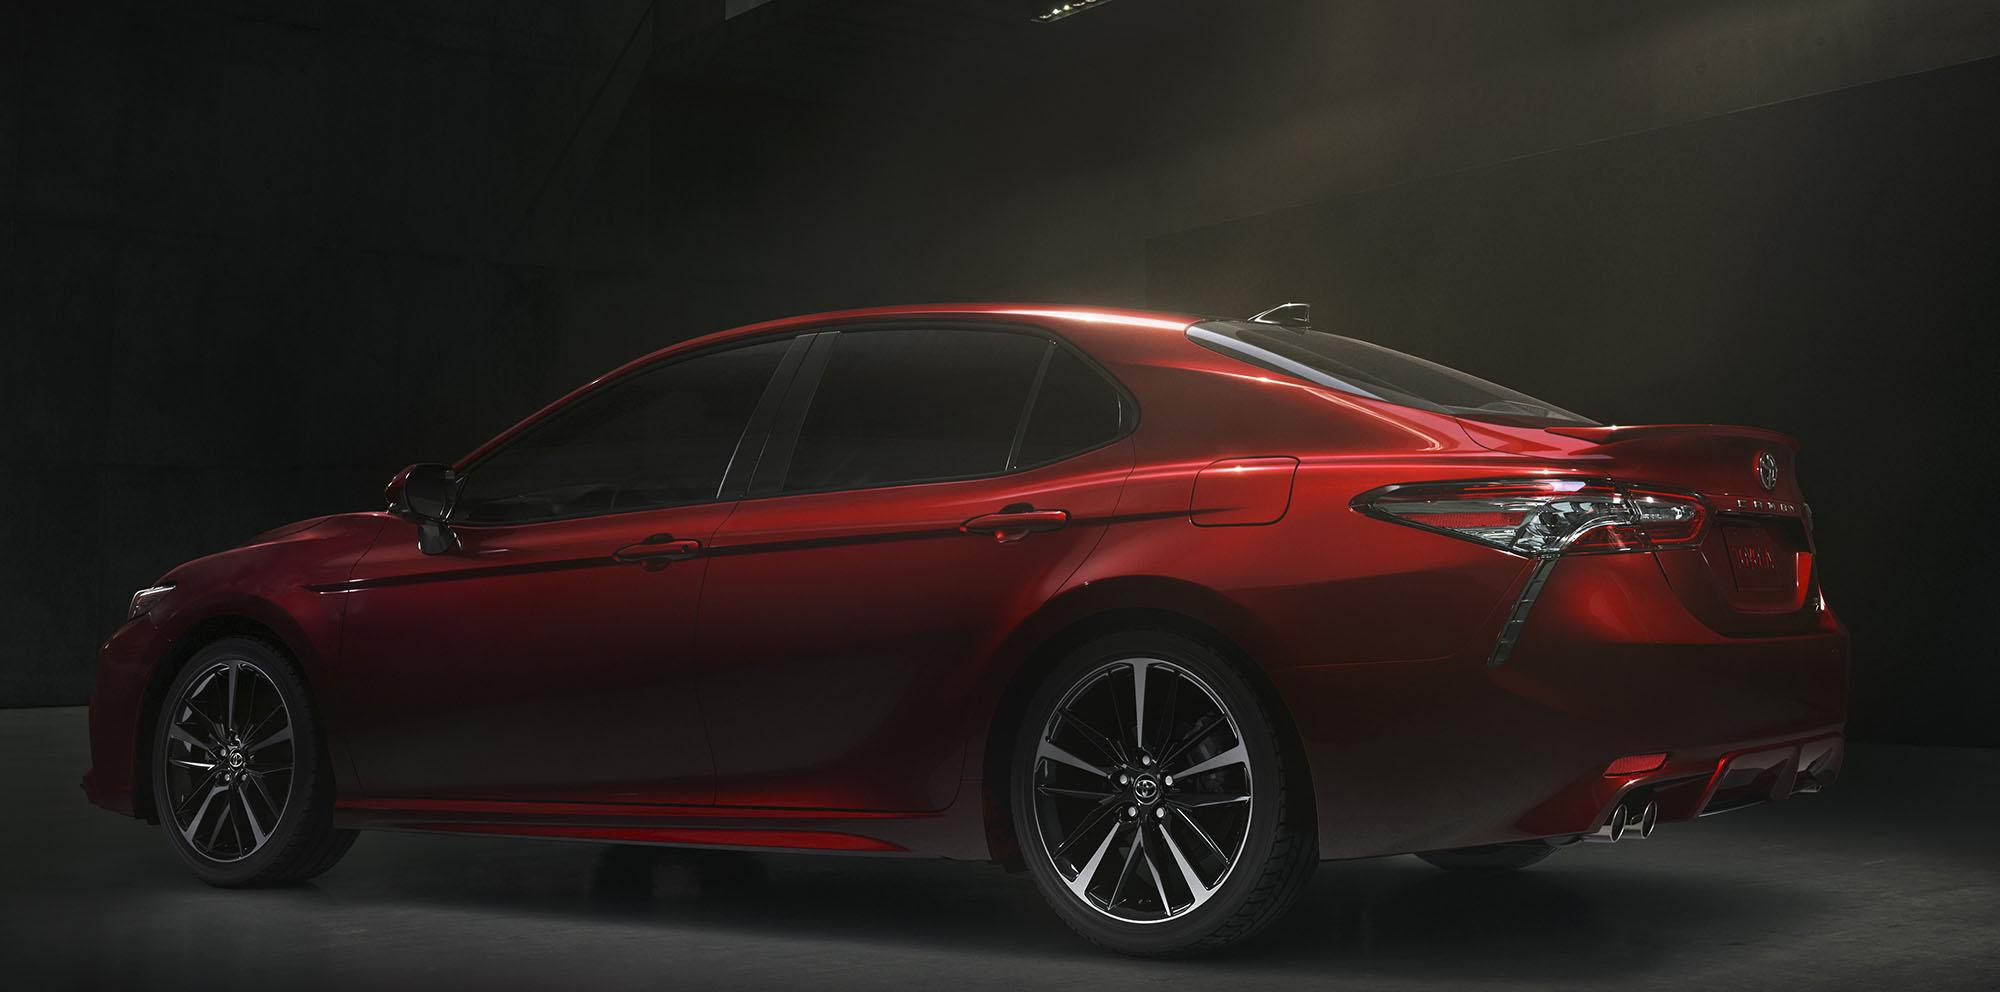 toyota camry revealed japan built sedan in australia from late 2017